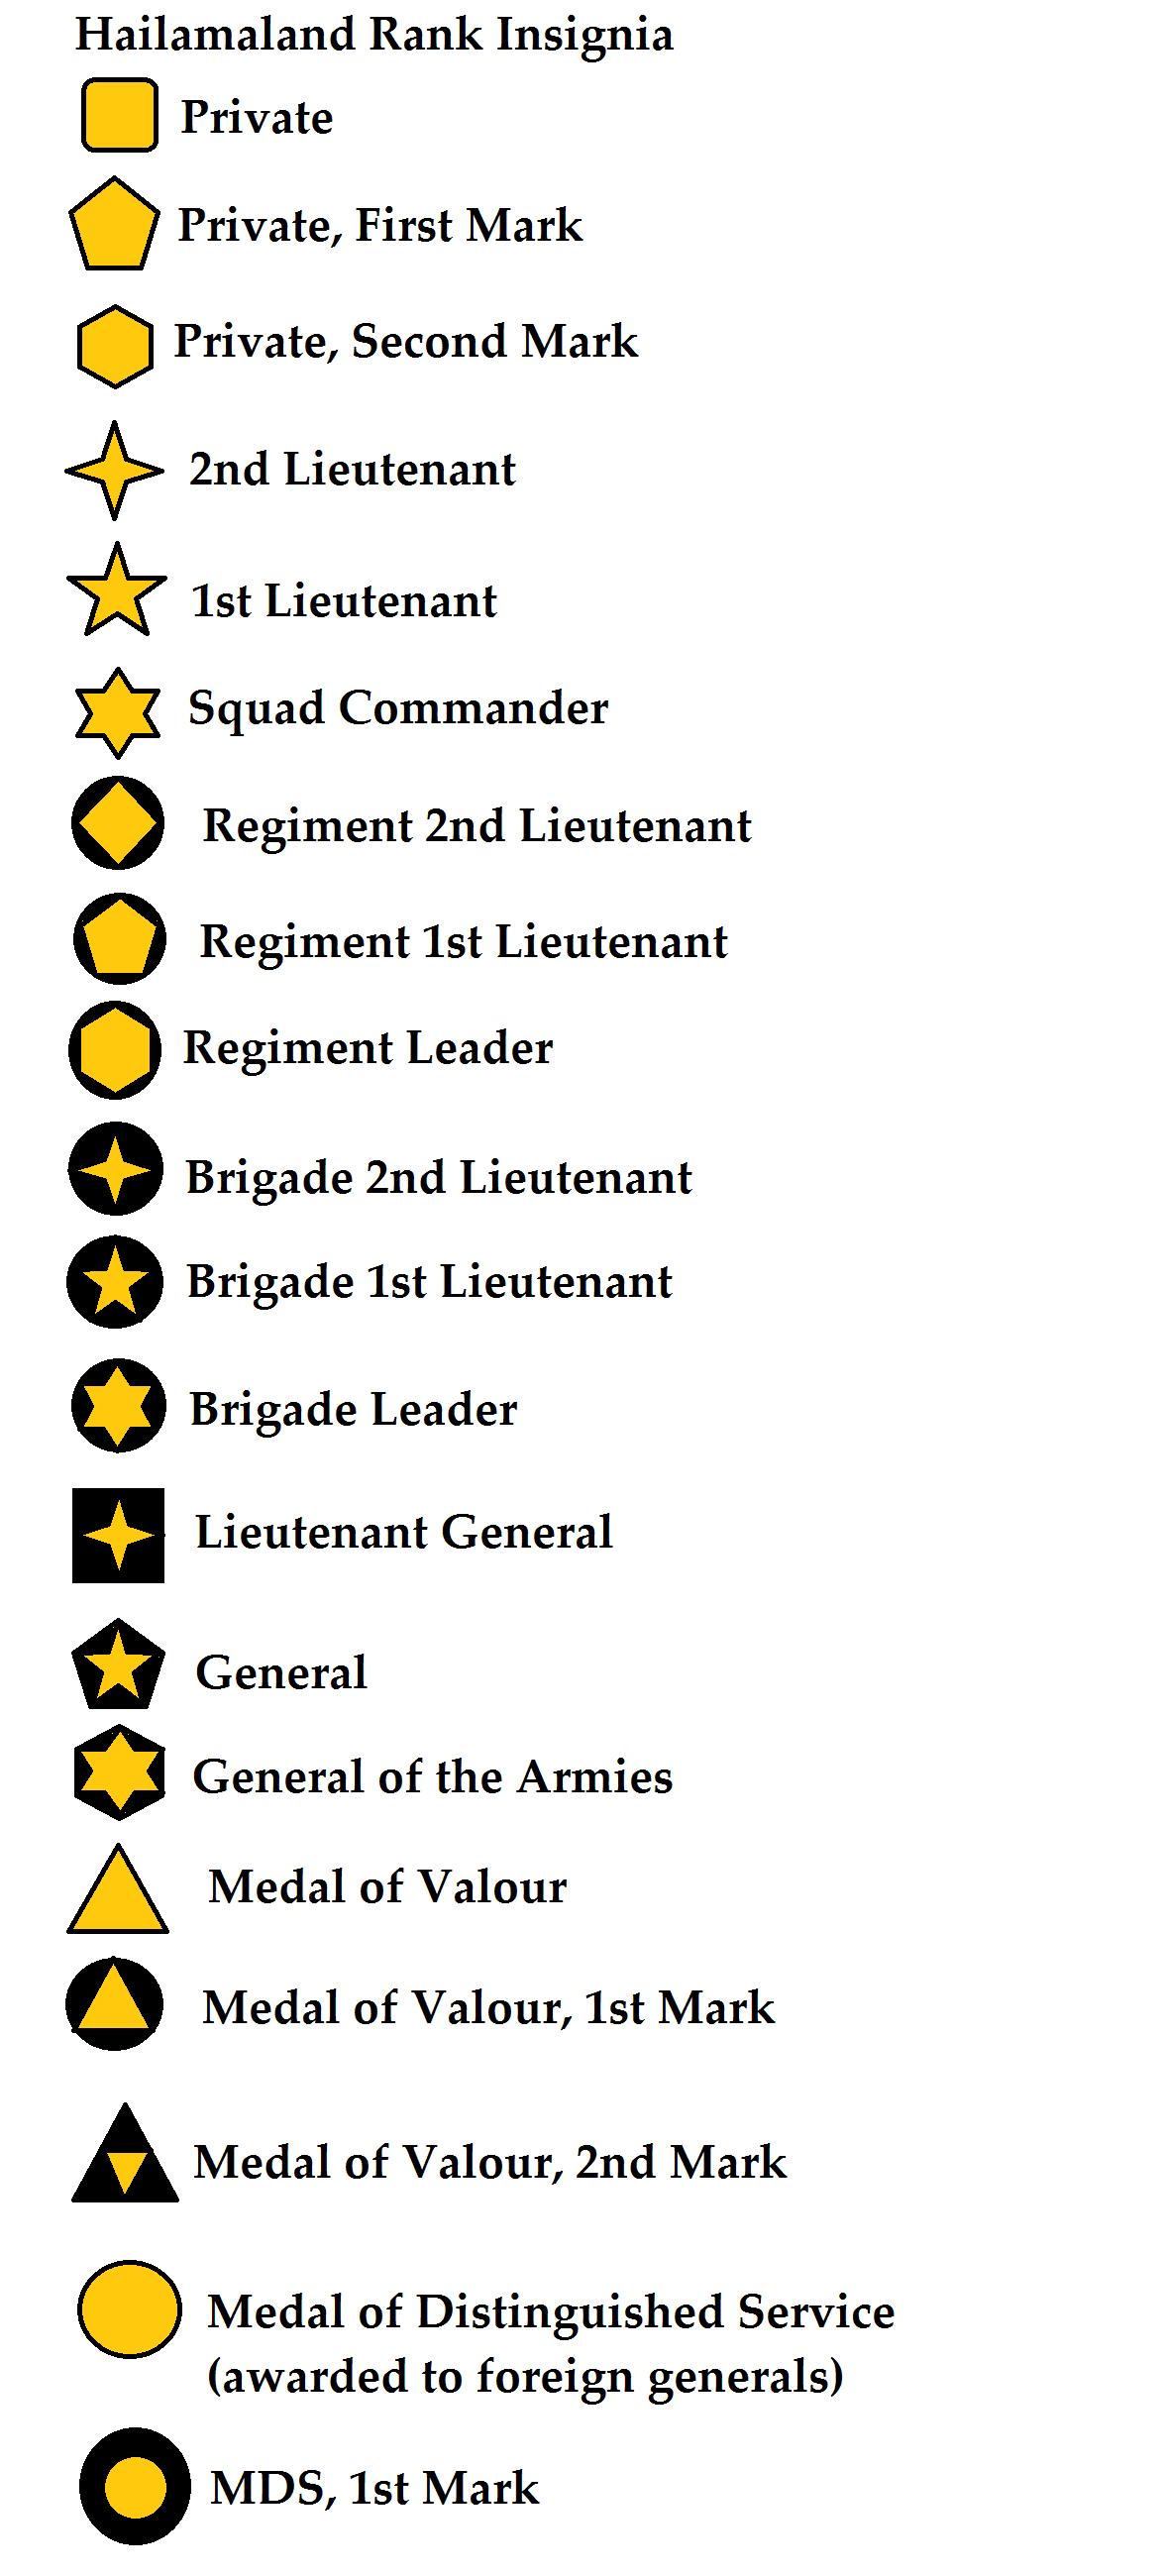 Rank insignia and uniforms thread page 42 alternate history hailamaland rank insigniag buycottarizona Image collections